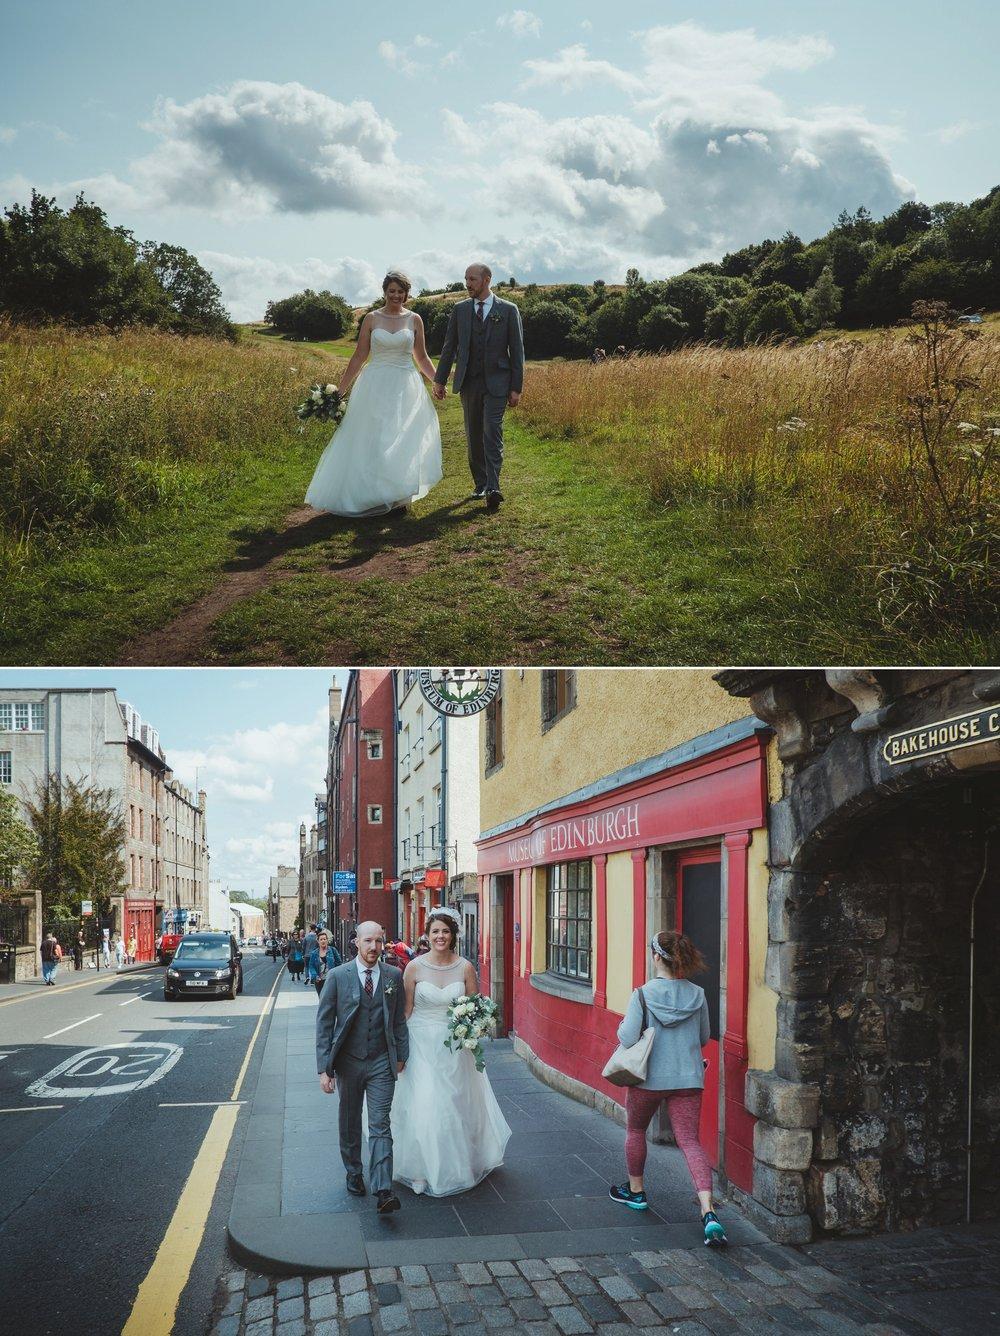 Angela___Andy_s_Edinburgh_elopement_by_Barry_Forshaw_0276.jpg